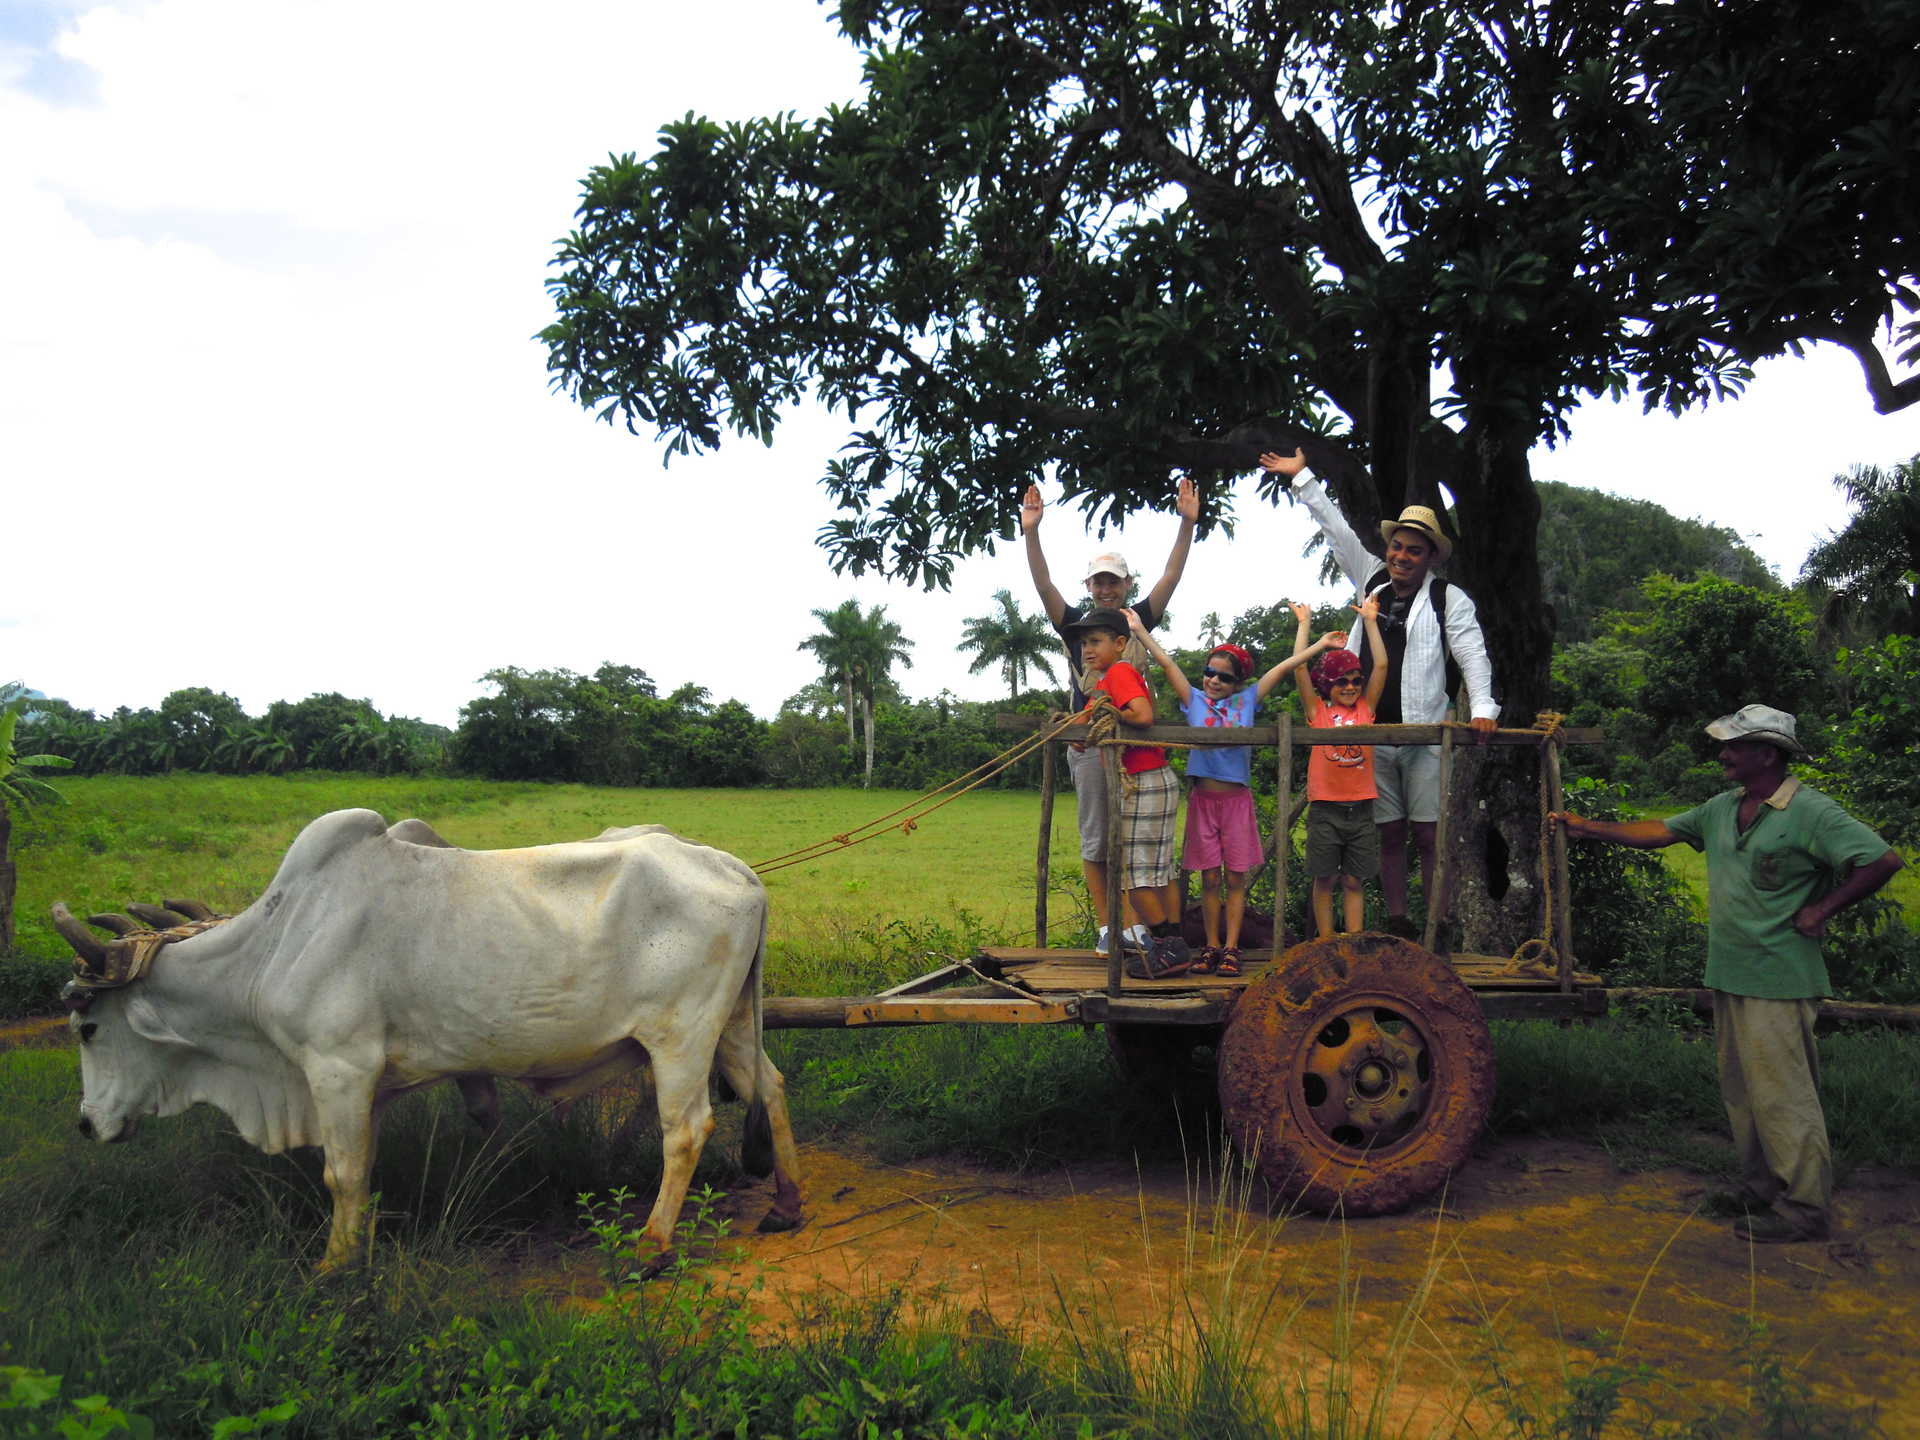 Cuba, Vinales, balade en char à boeuf